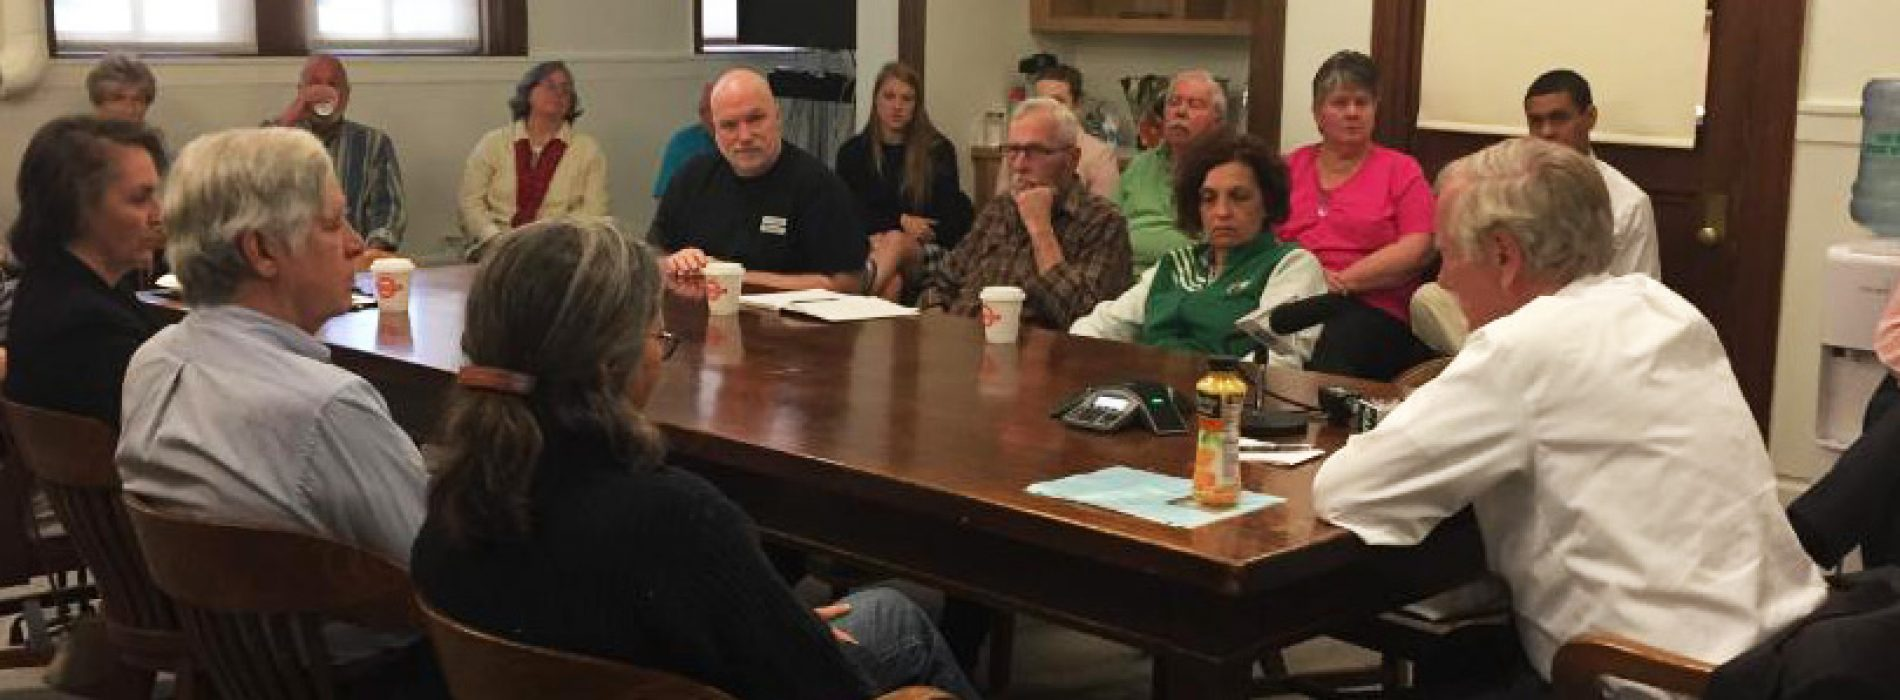 Sen. King, AARP highlight devastating effect of health care repeal on older Mainers